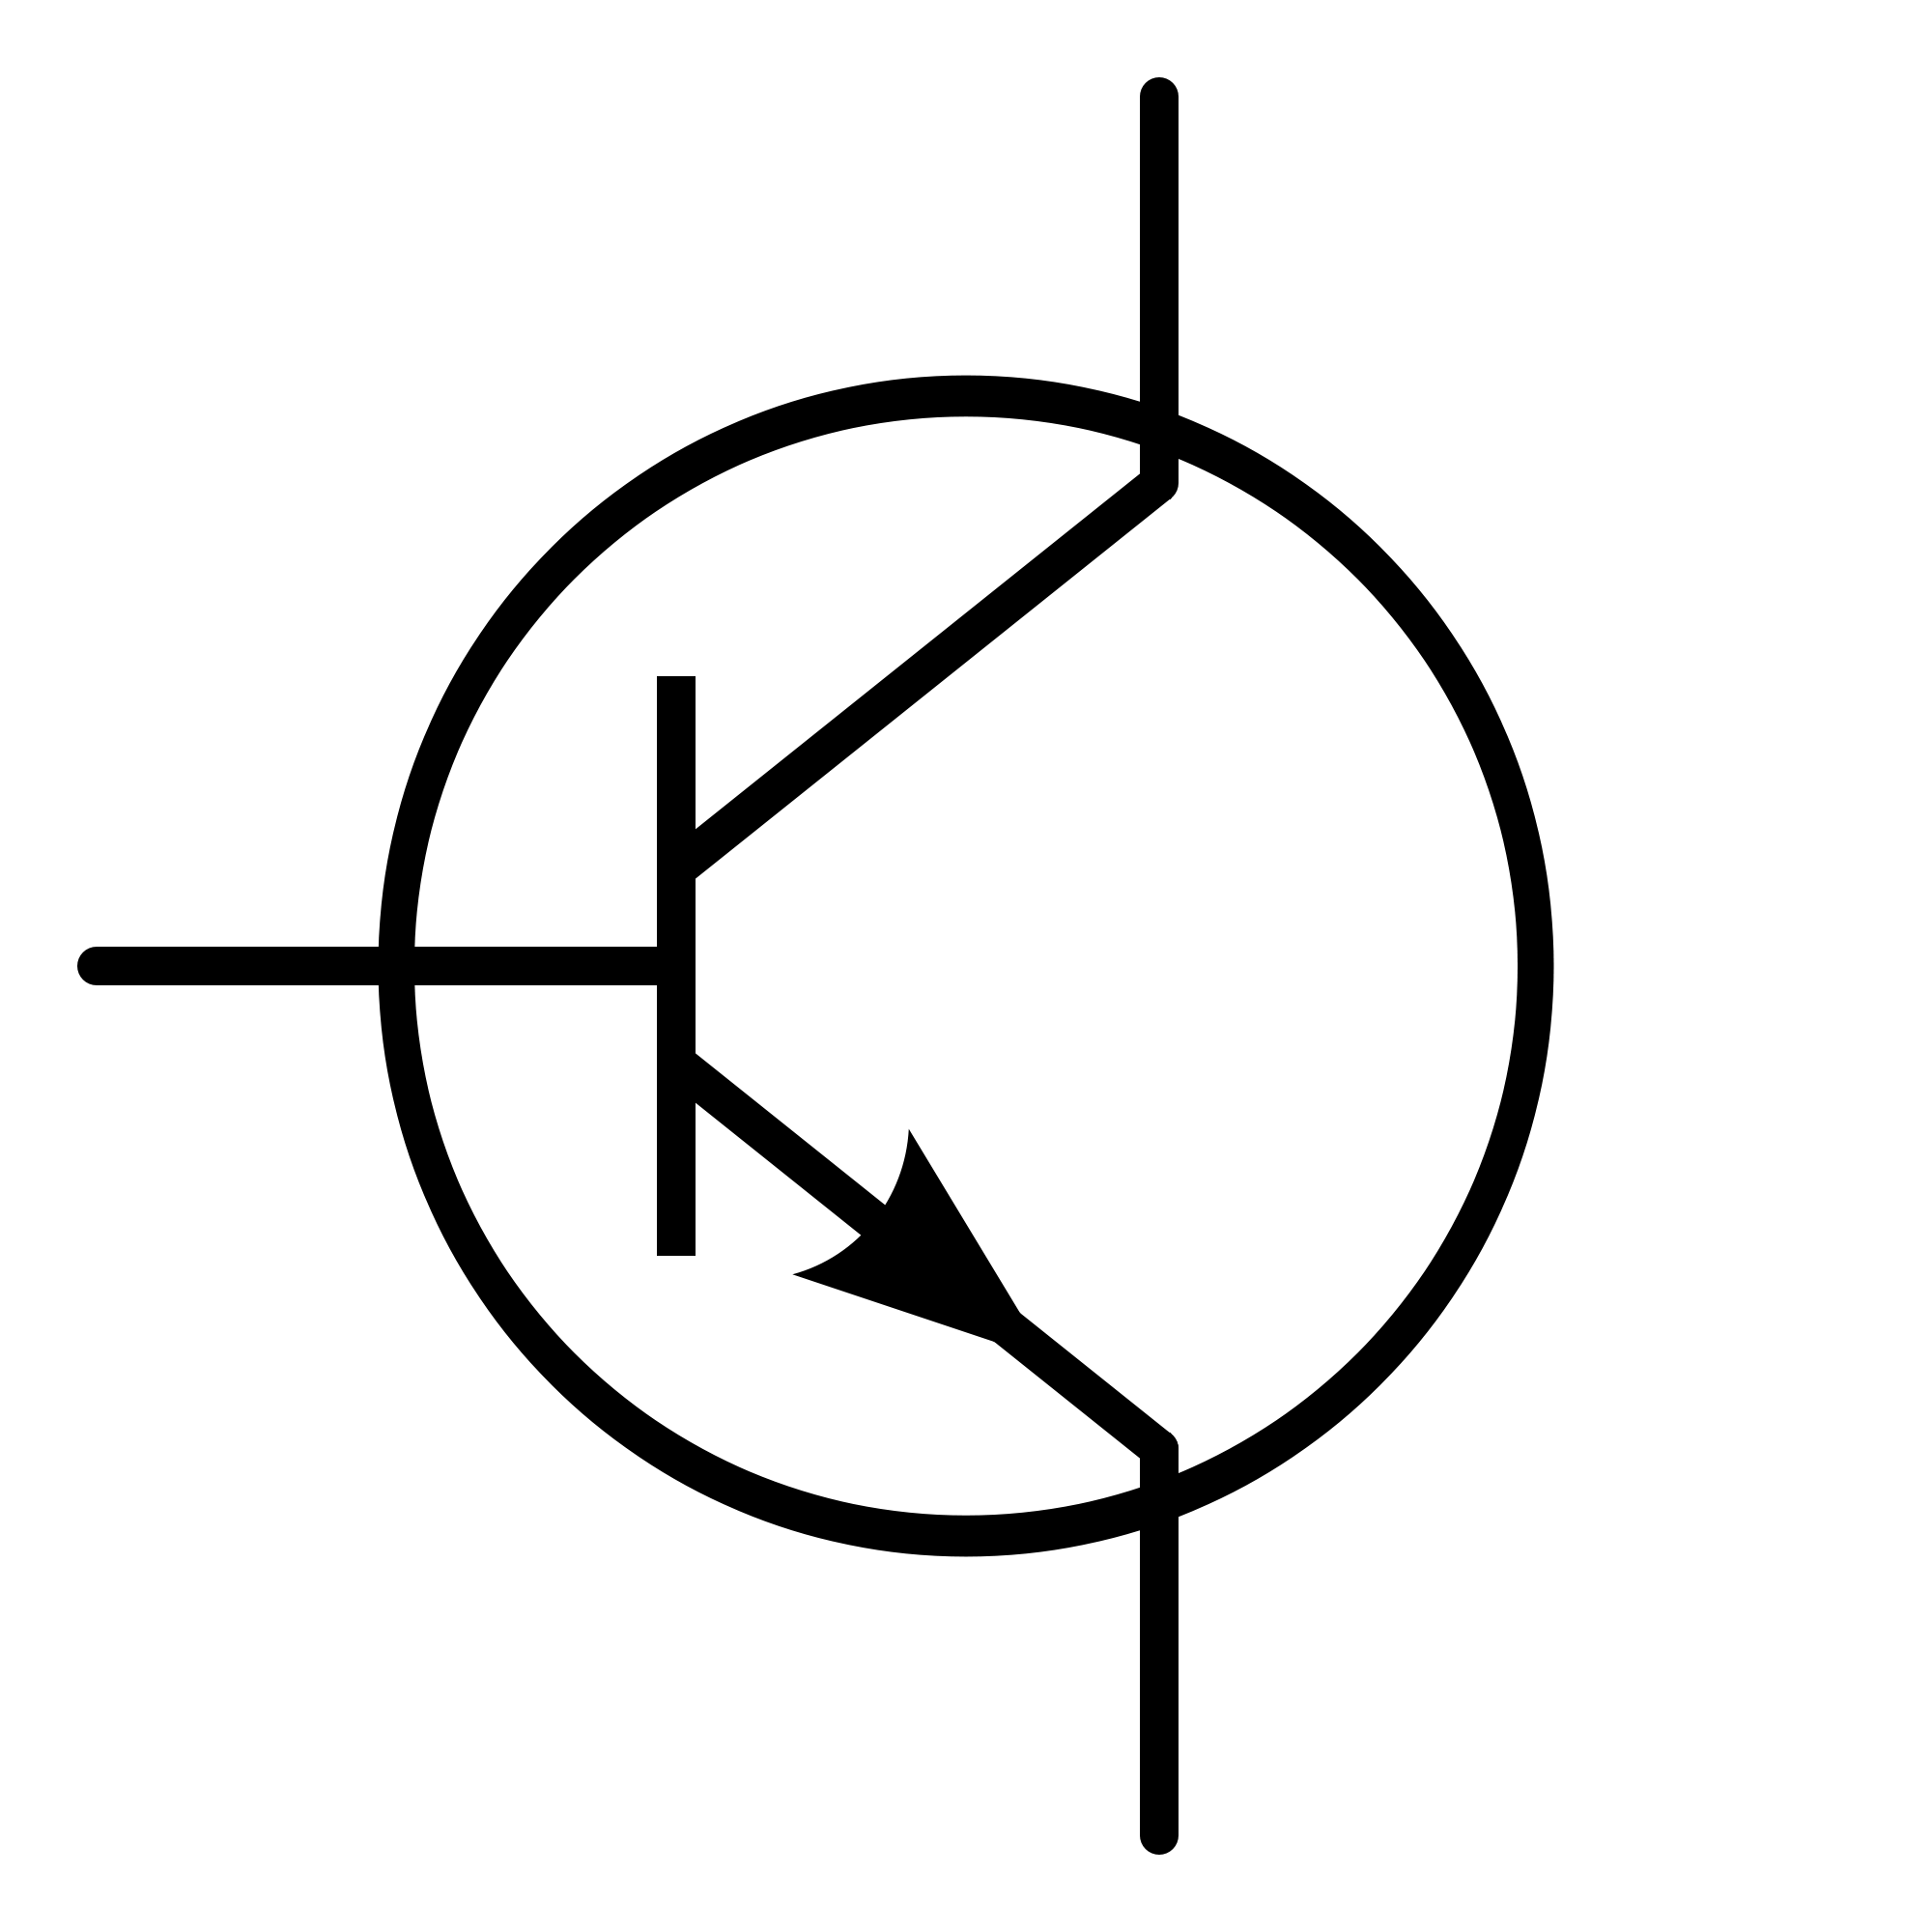 transistor symbol images